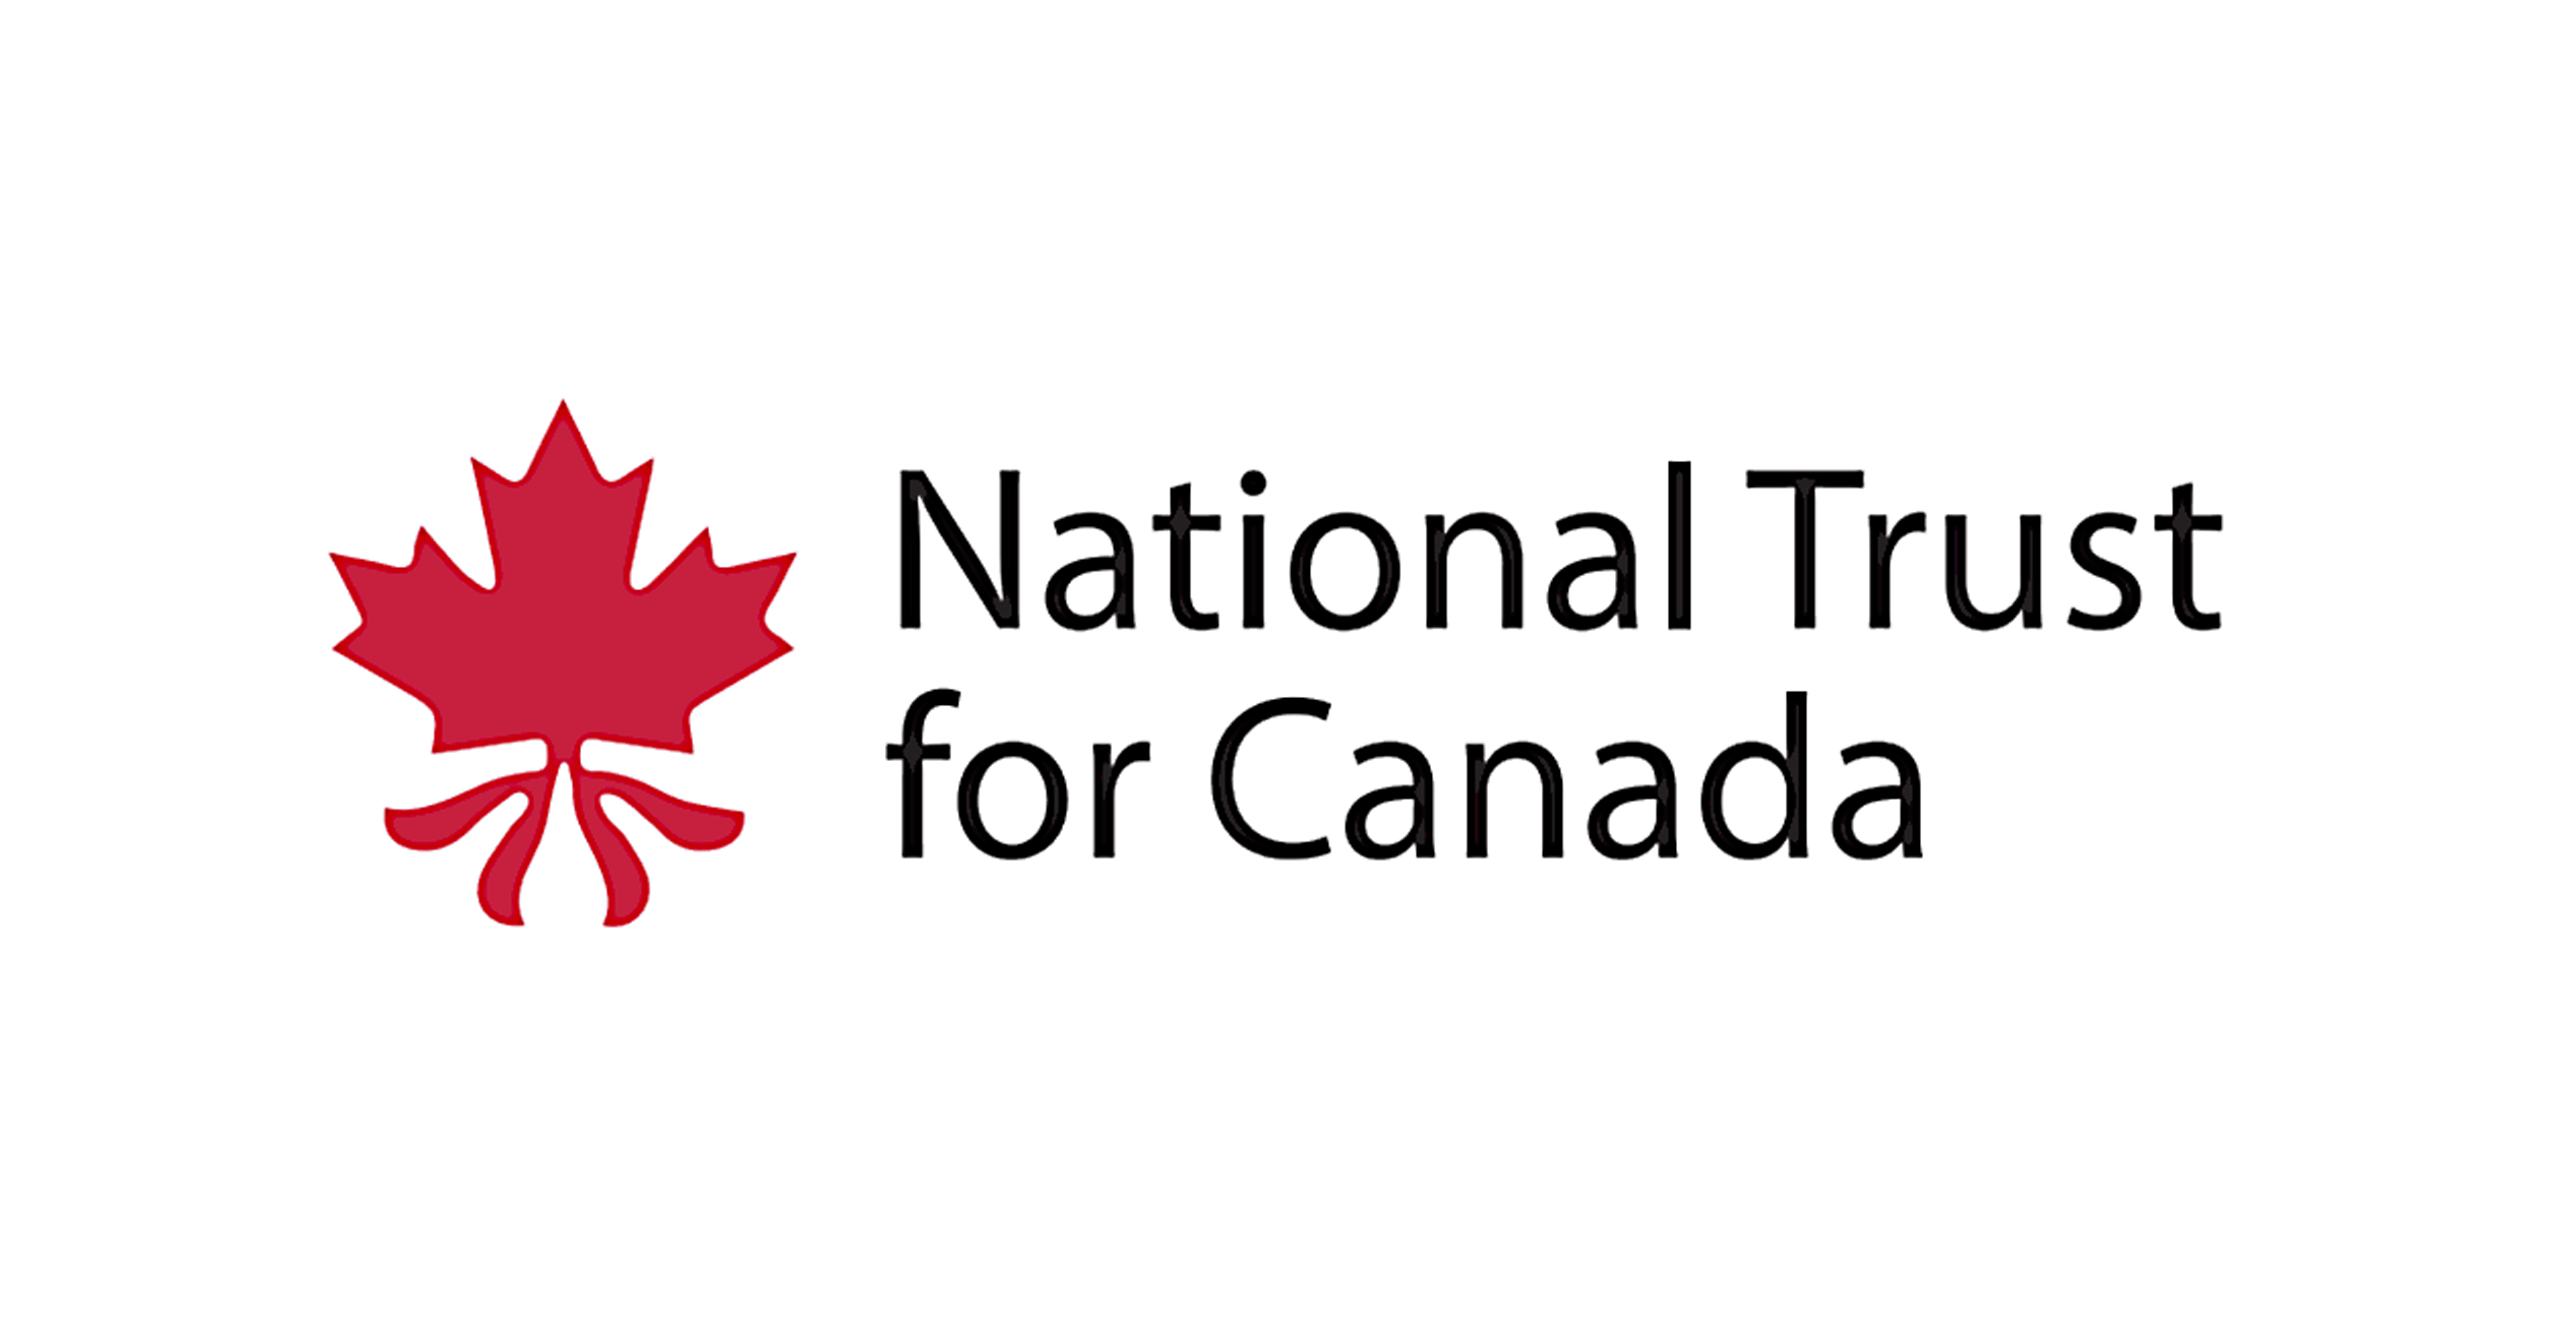 National Trust for Canada logo design